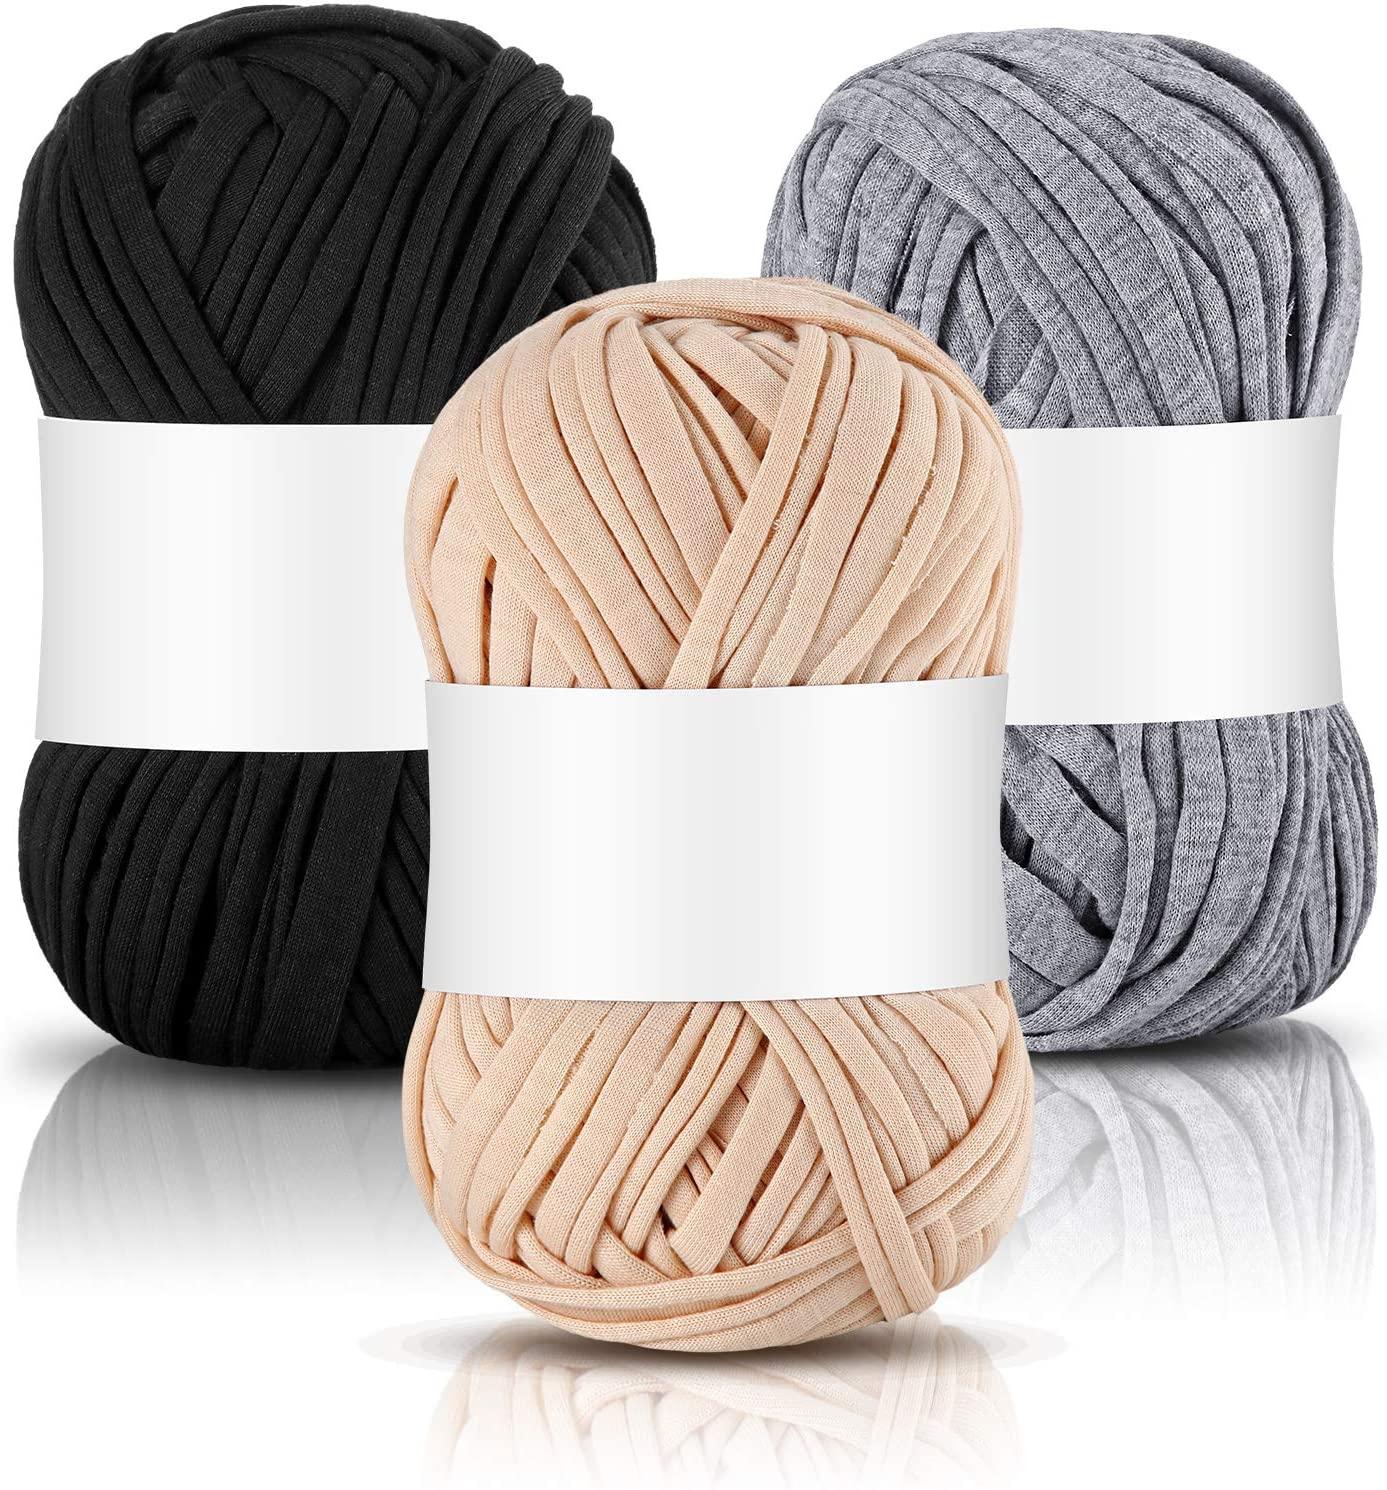 Nuanchu T-Shirt Yarn Fabric Knitting Yarn Spaghetti Yarn Craft in Approx. 121.4 Yards/ 111 Meter Long for Hand DIY Bag Blanket Cushion Crocheting Projects